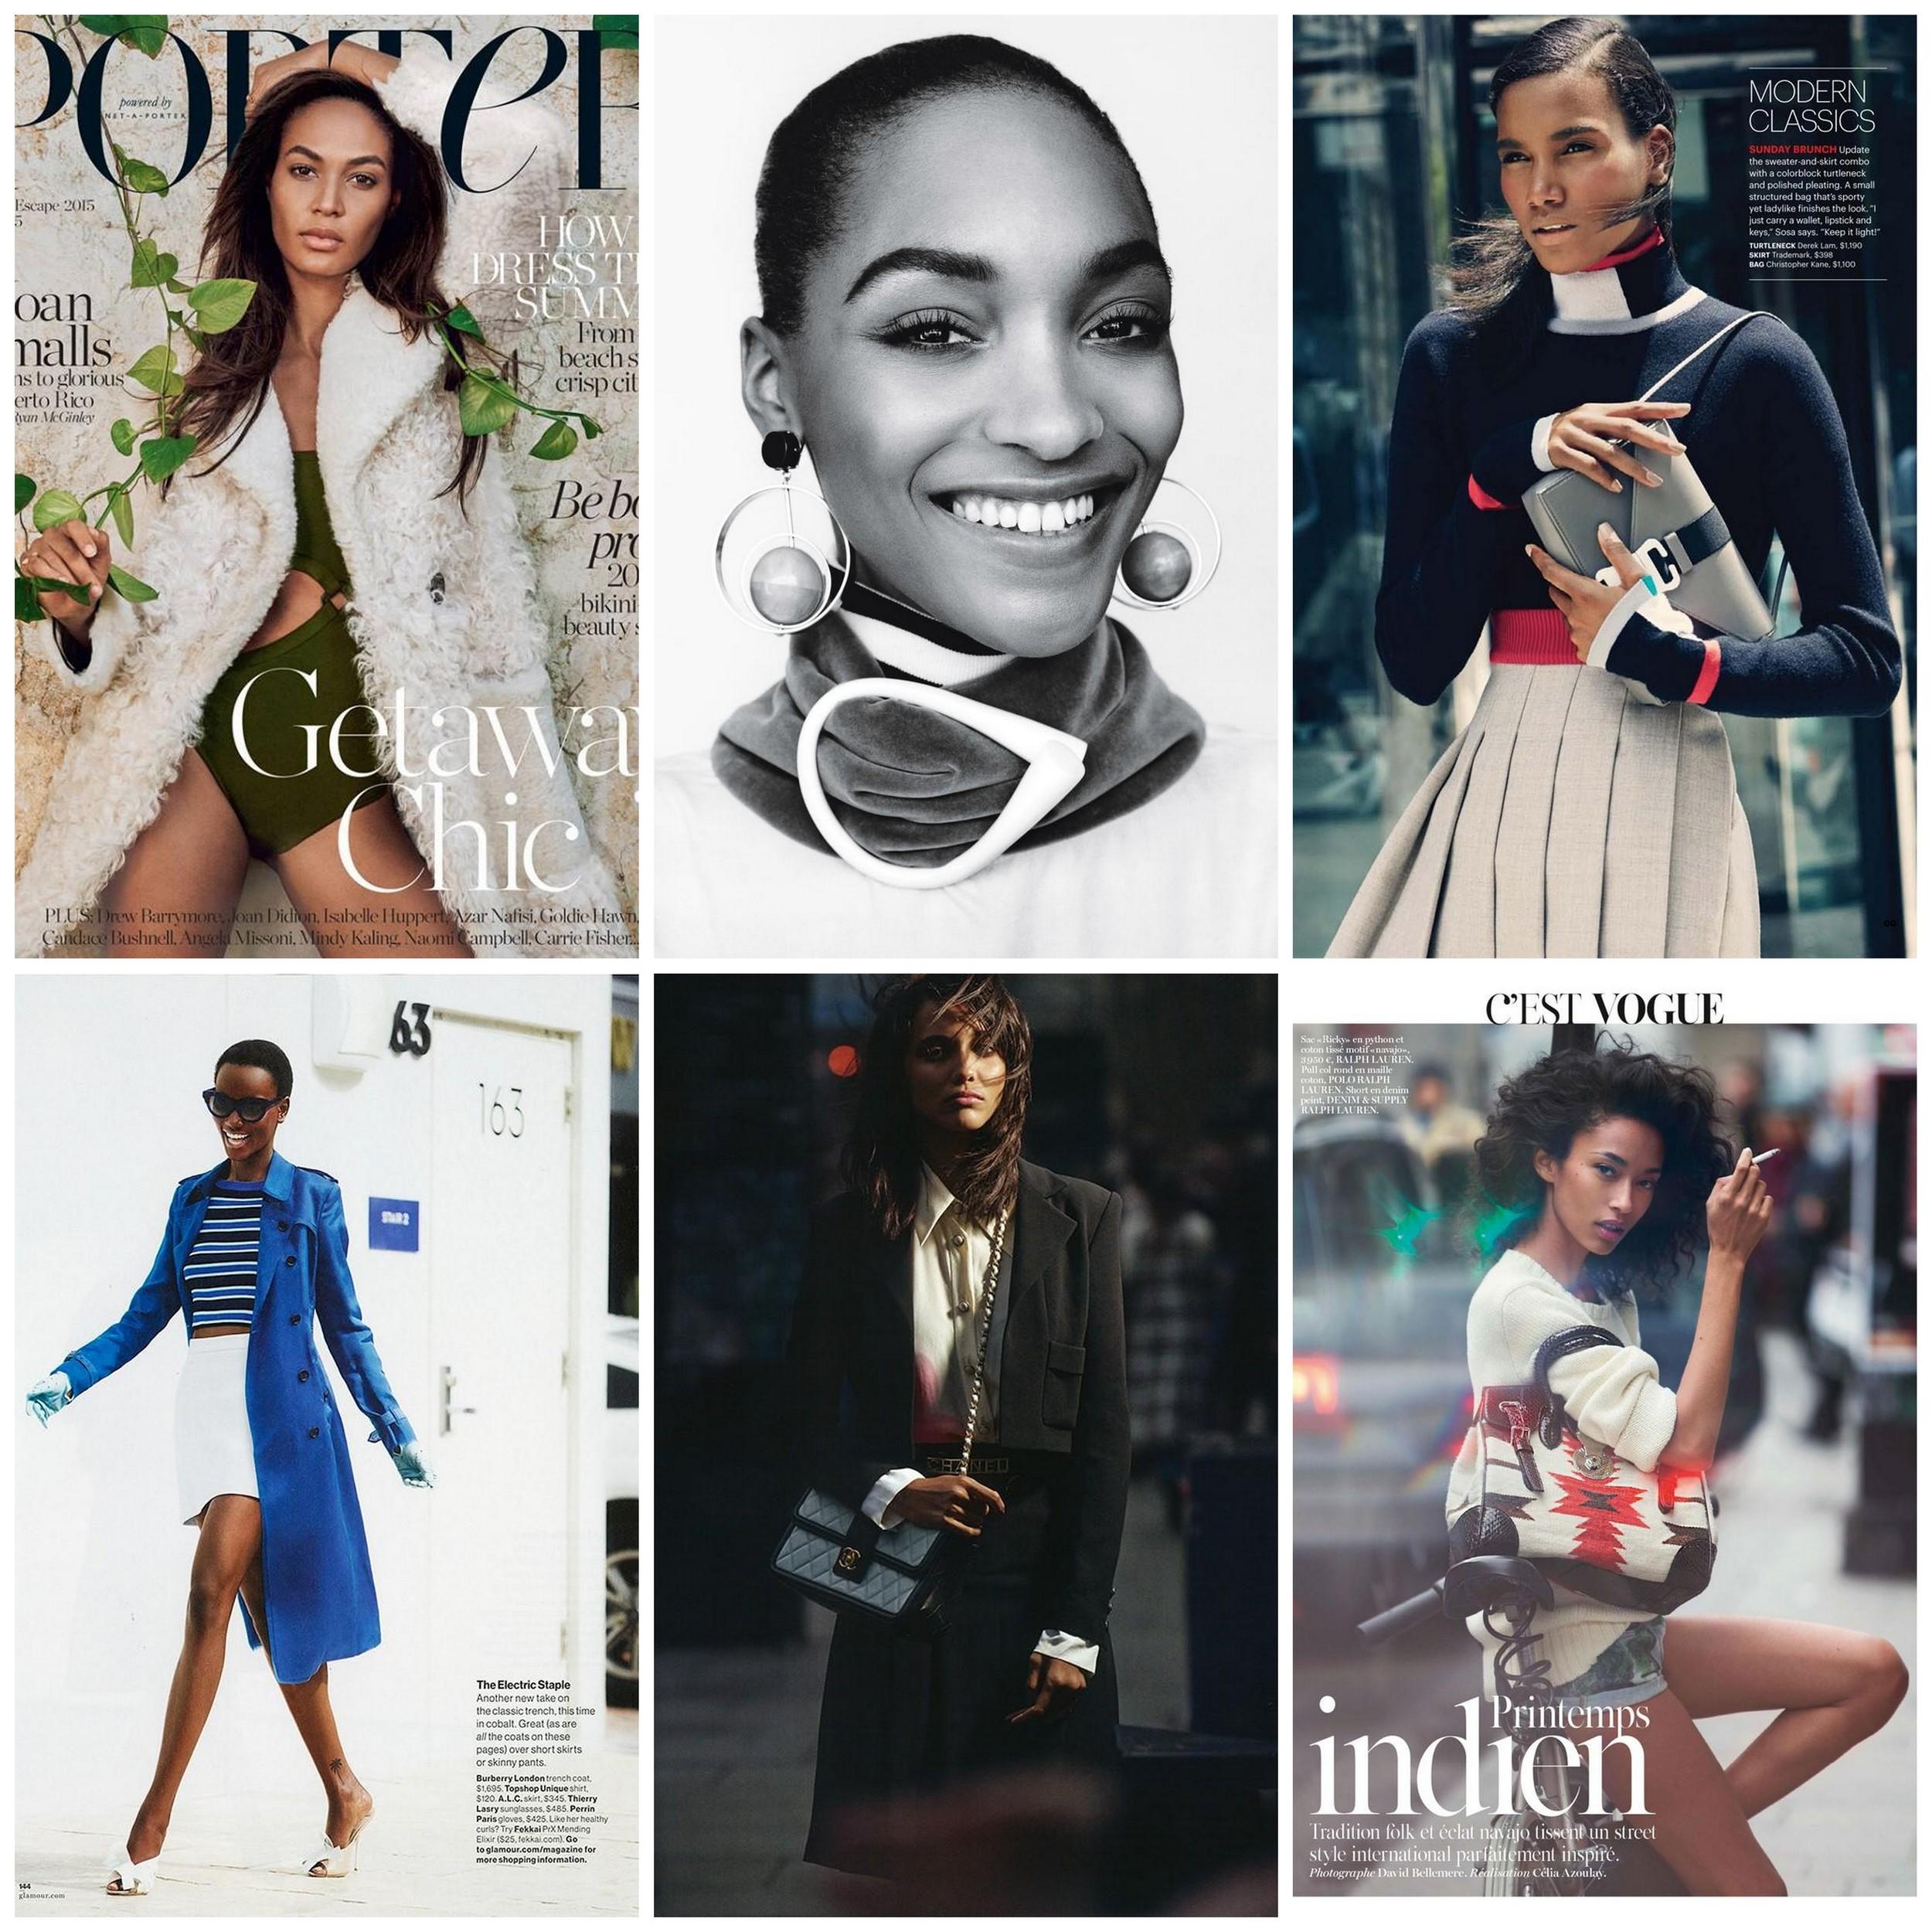 "Joan Smalls, Jourdan Dunn, Arlenis Sosa, Anais Mali, Cora Emmanuel, and Harieth Paul are the six black women of 81 women on the  Models.com  ""Money Girls"" list.For image details, see below."